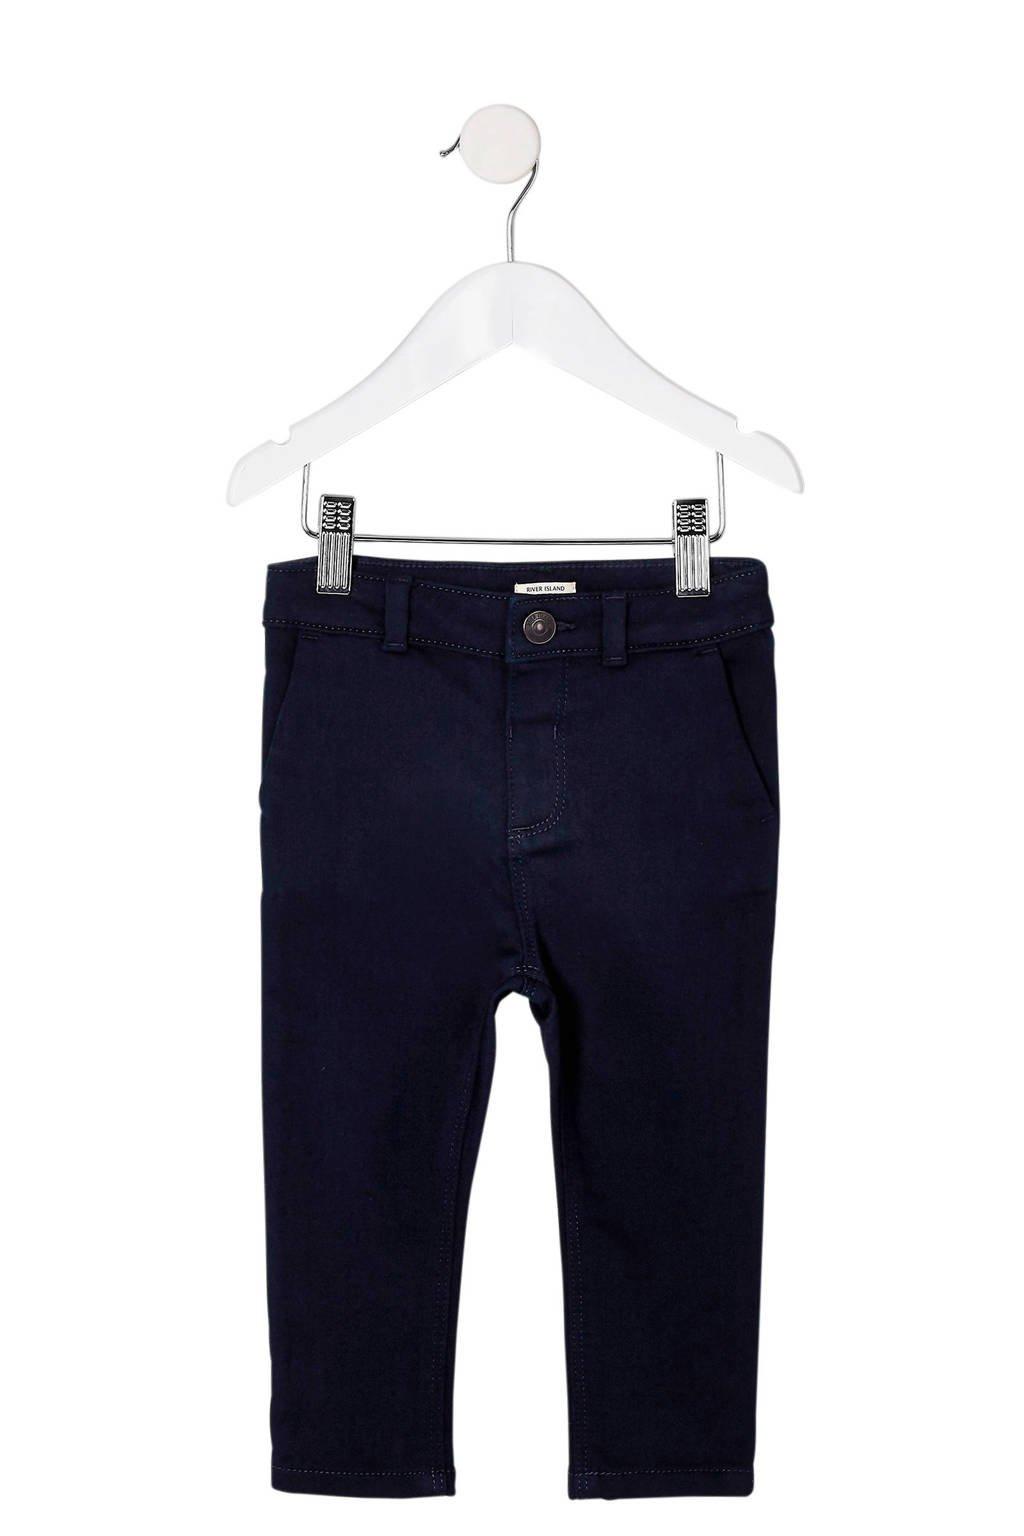 River Island chino jeans, Dark denim